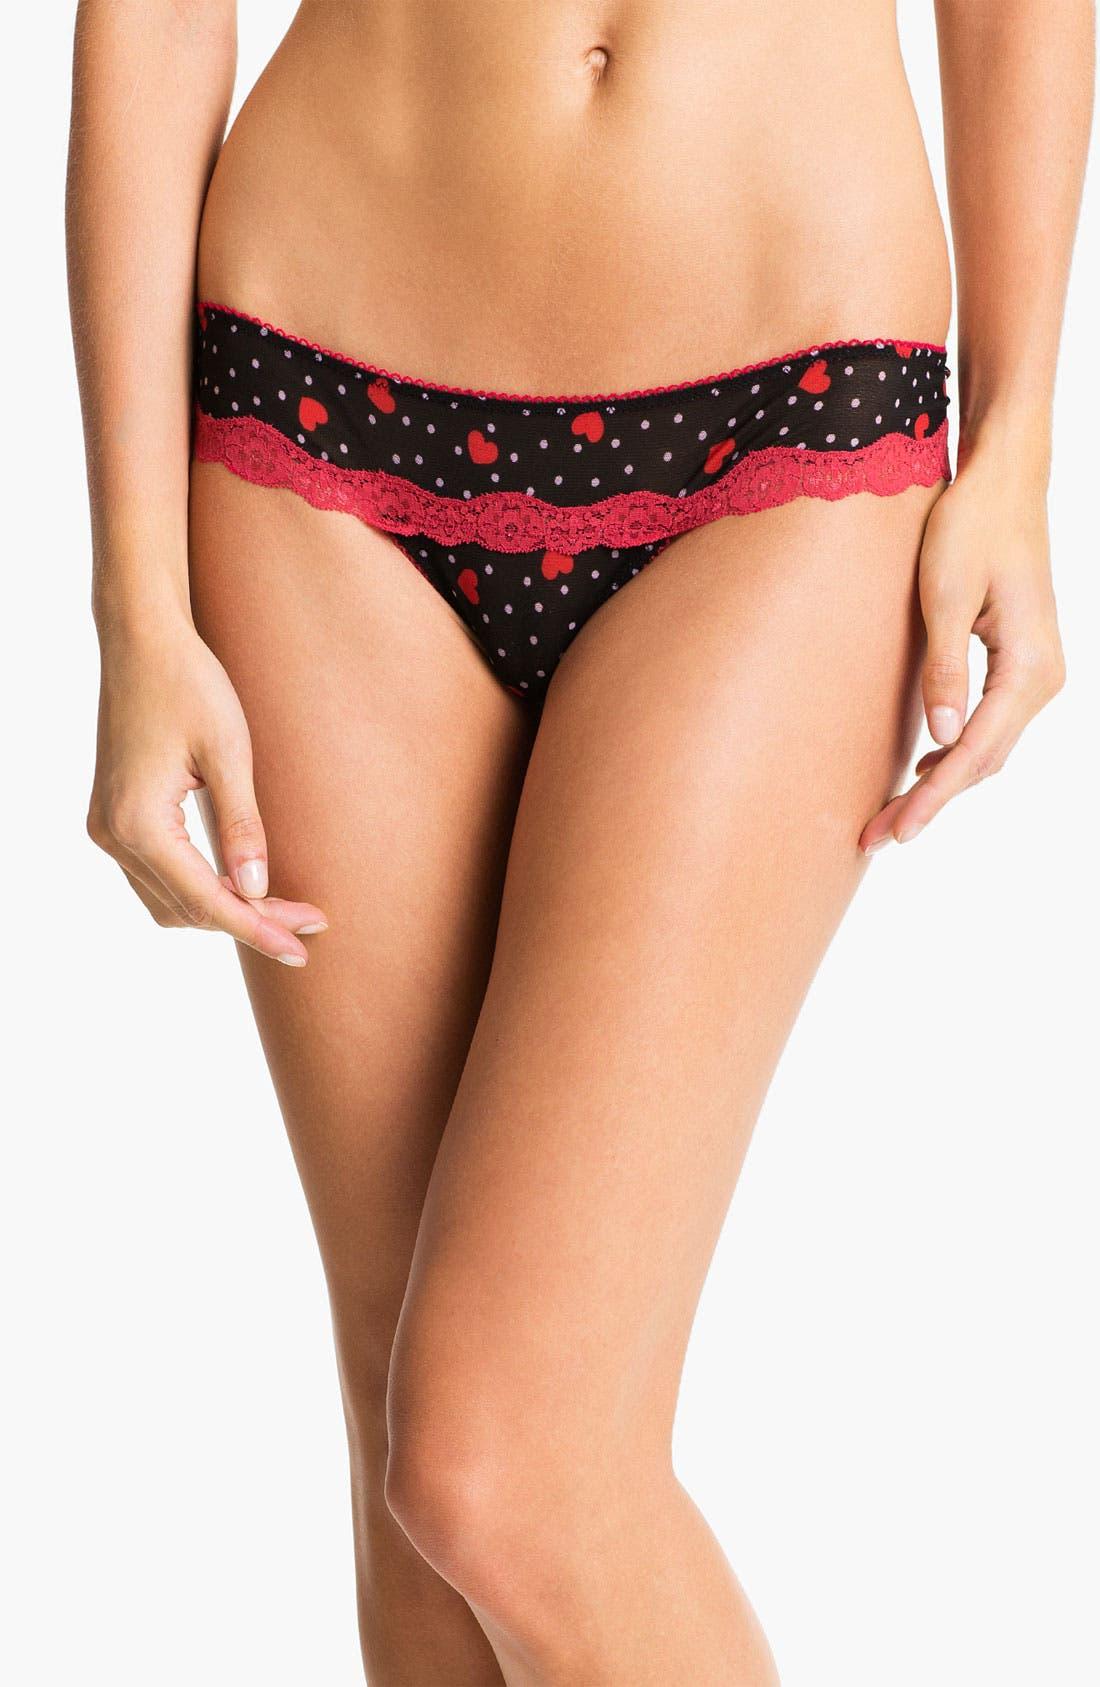 Alternate Image 1 Selected - Honeydew Intimates Back Lace Thong